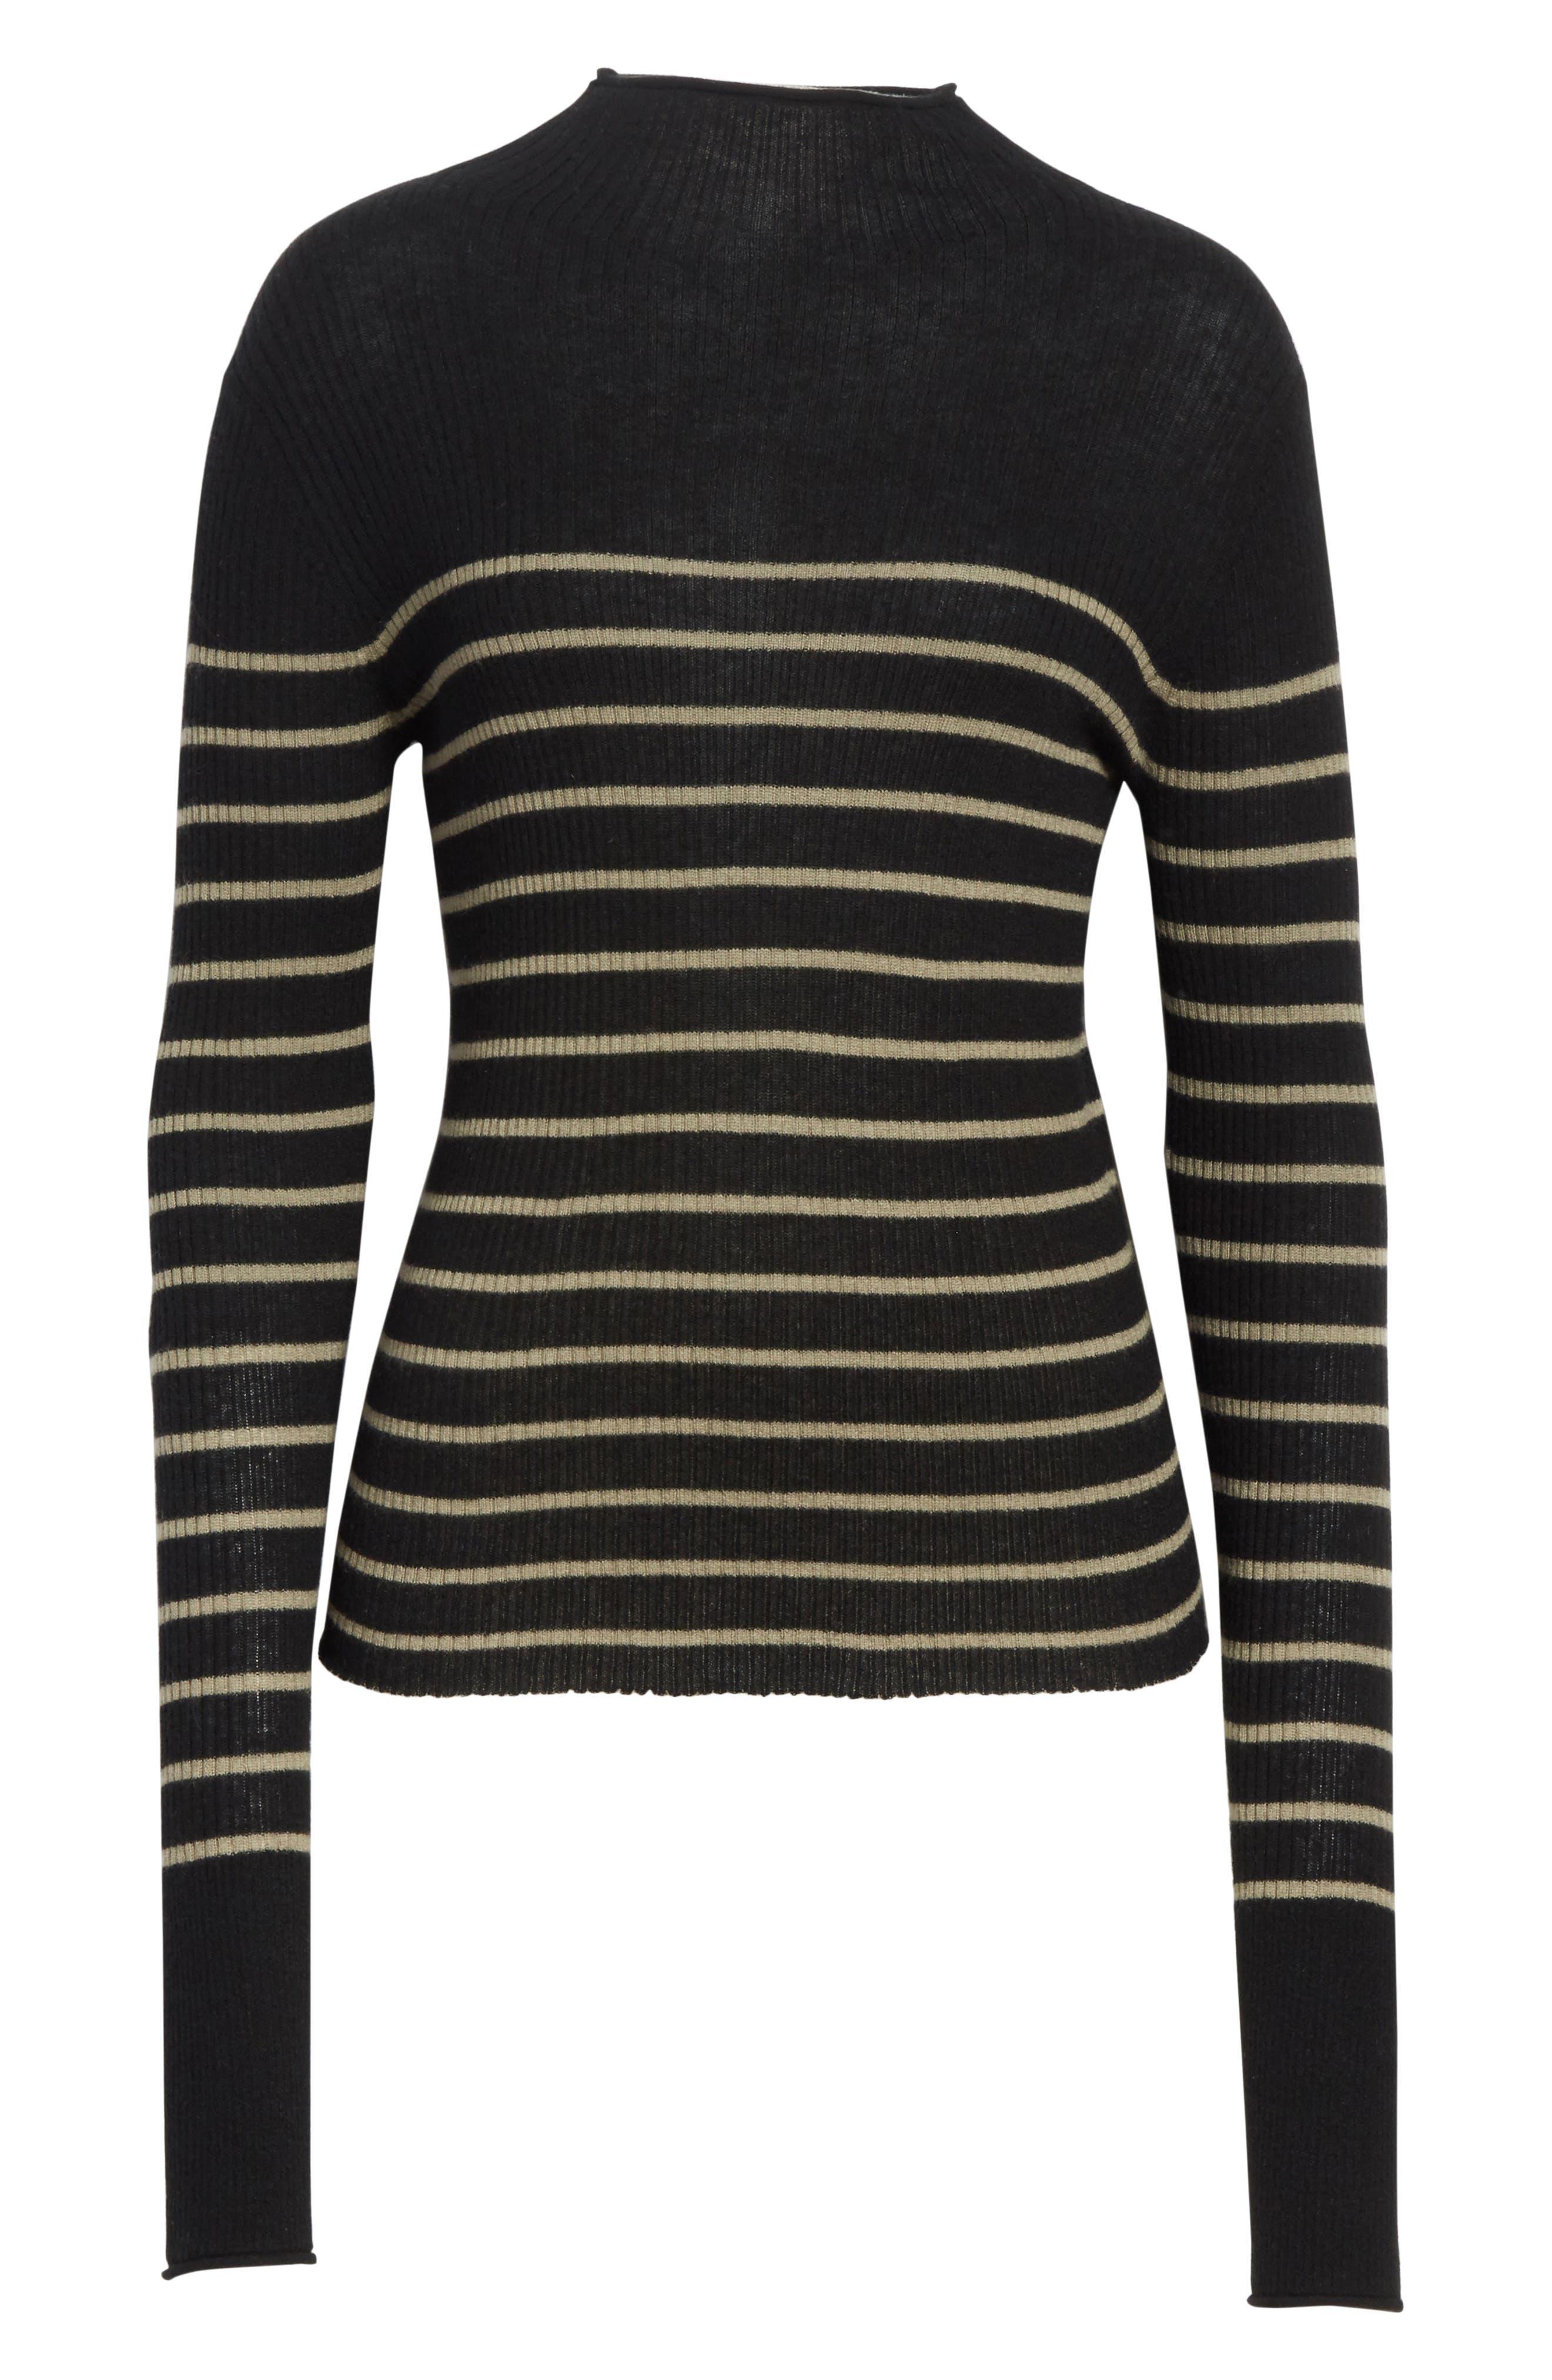 Stripe Ribbed Cashmere Sweater,                             Alternate thumbnail 6, color,                             Black/ Pebble Taupe